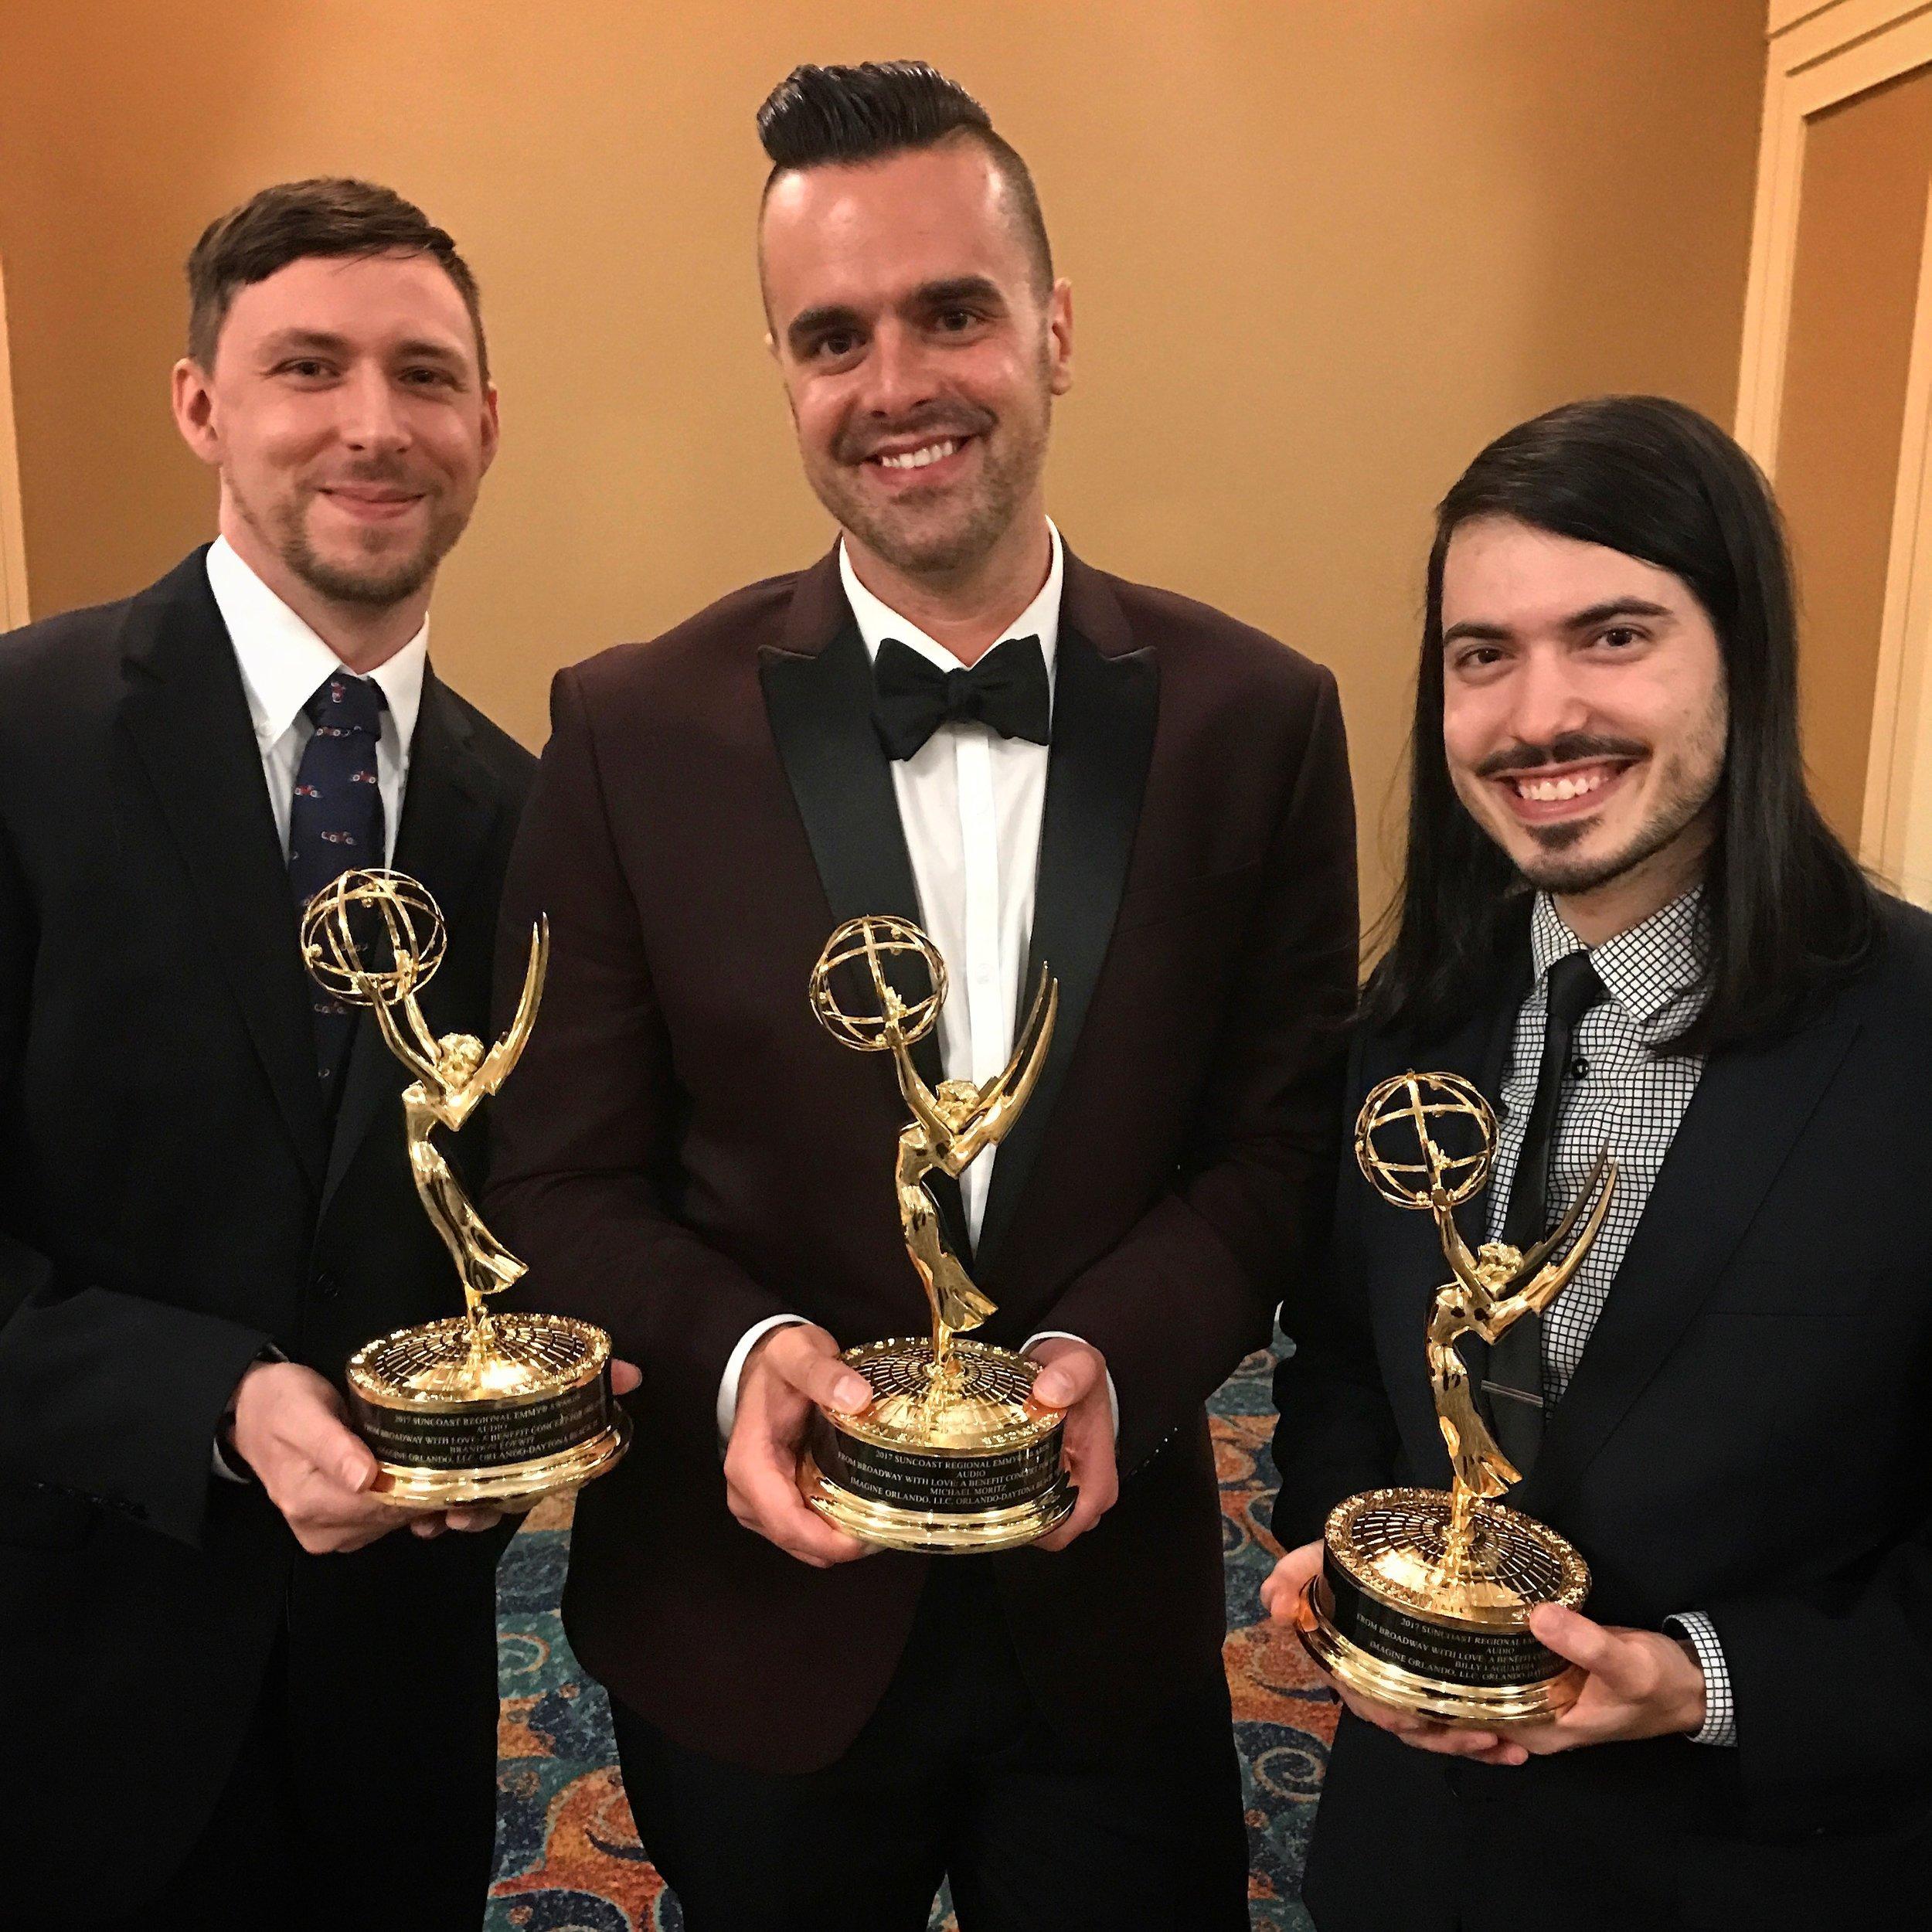 Pictured (L-R): Brandon Loewit, Michael J Moritz Jr, & Billy LaGuardia